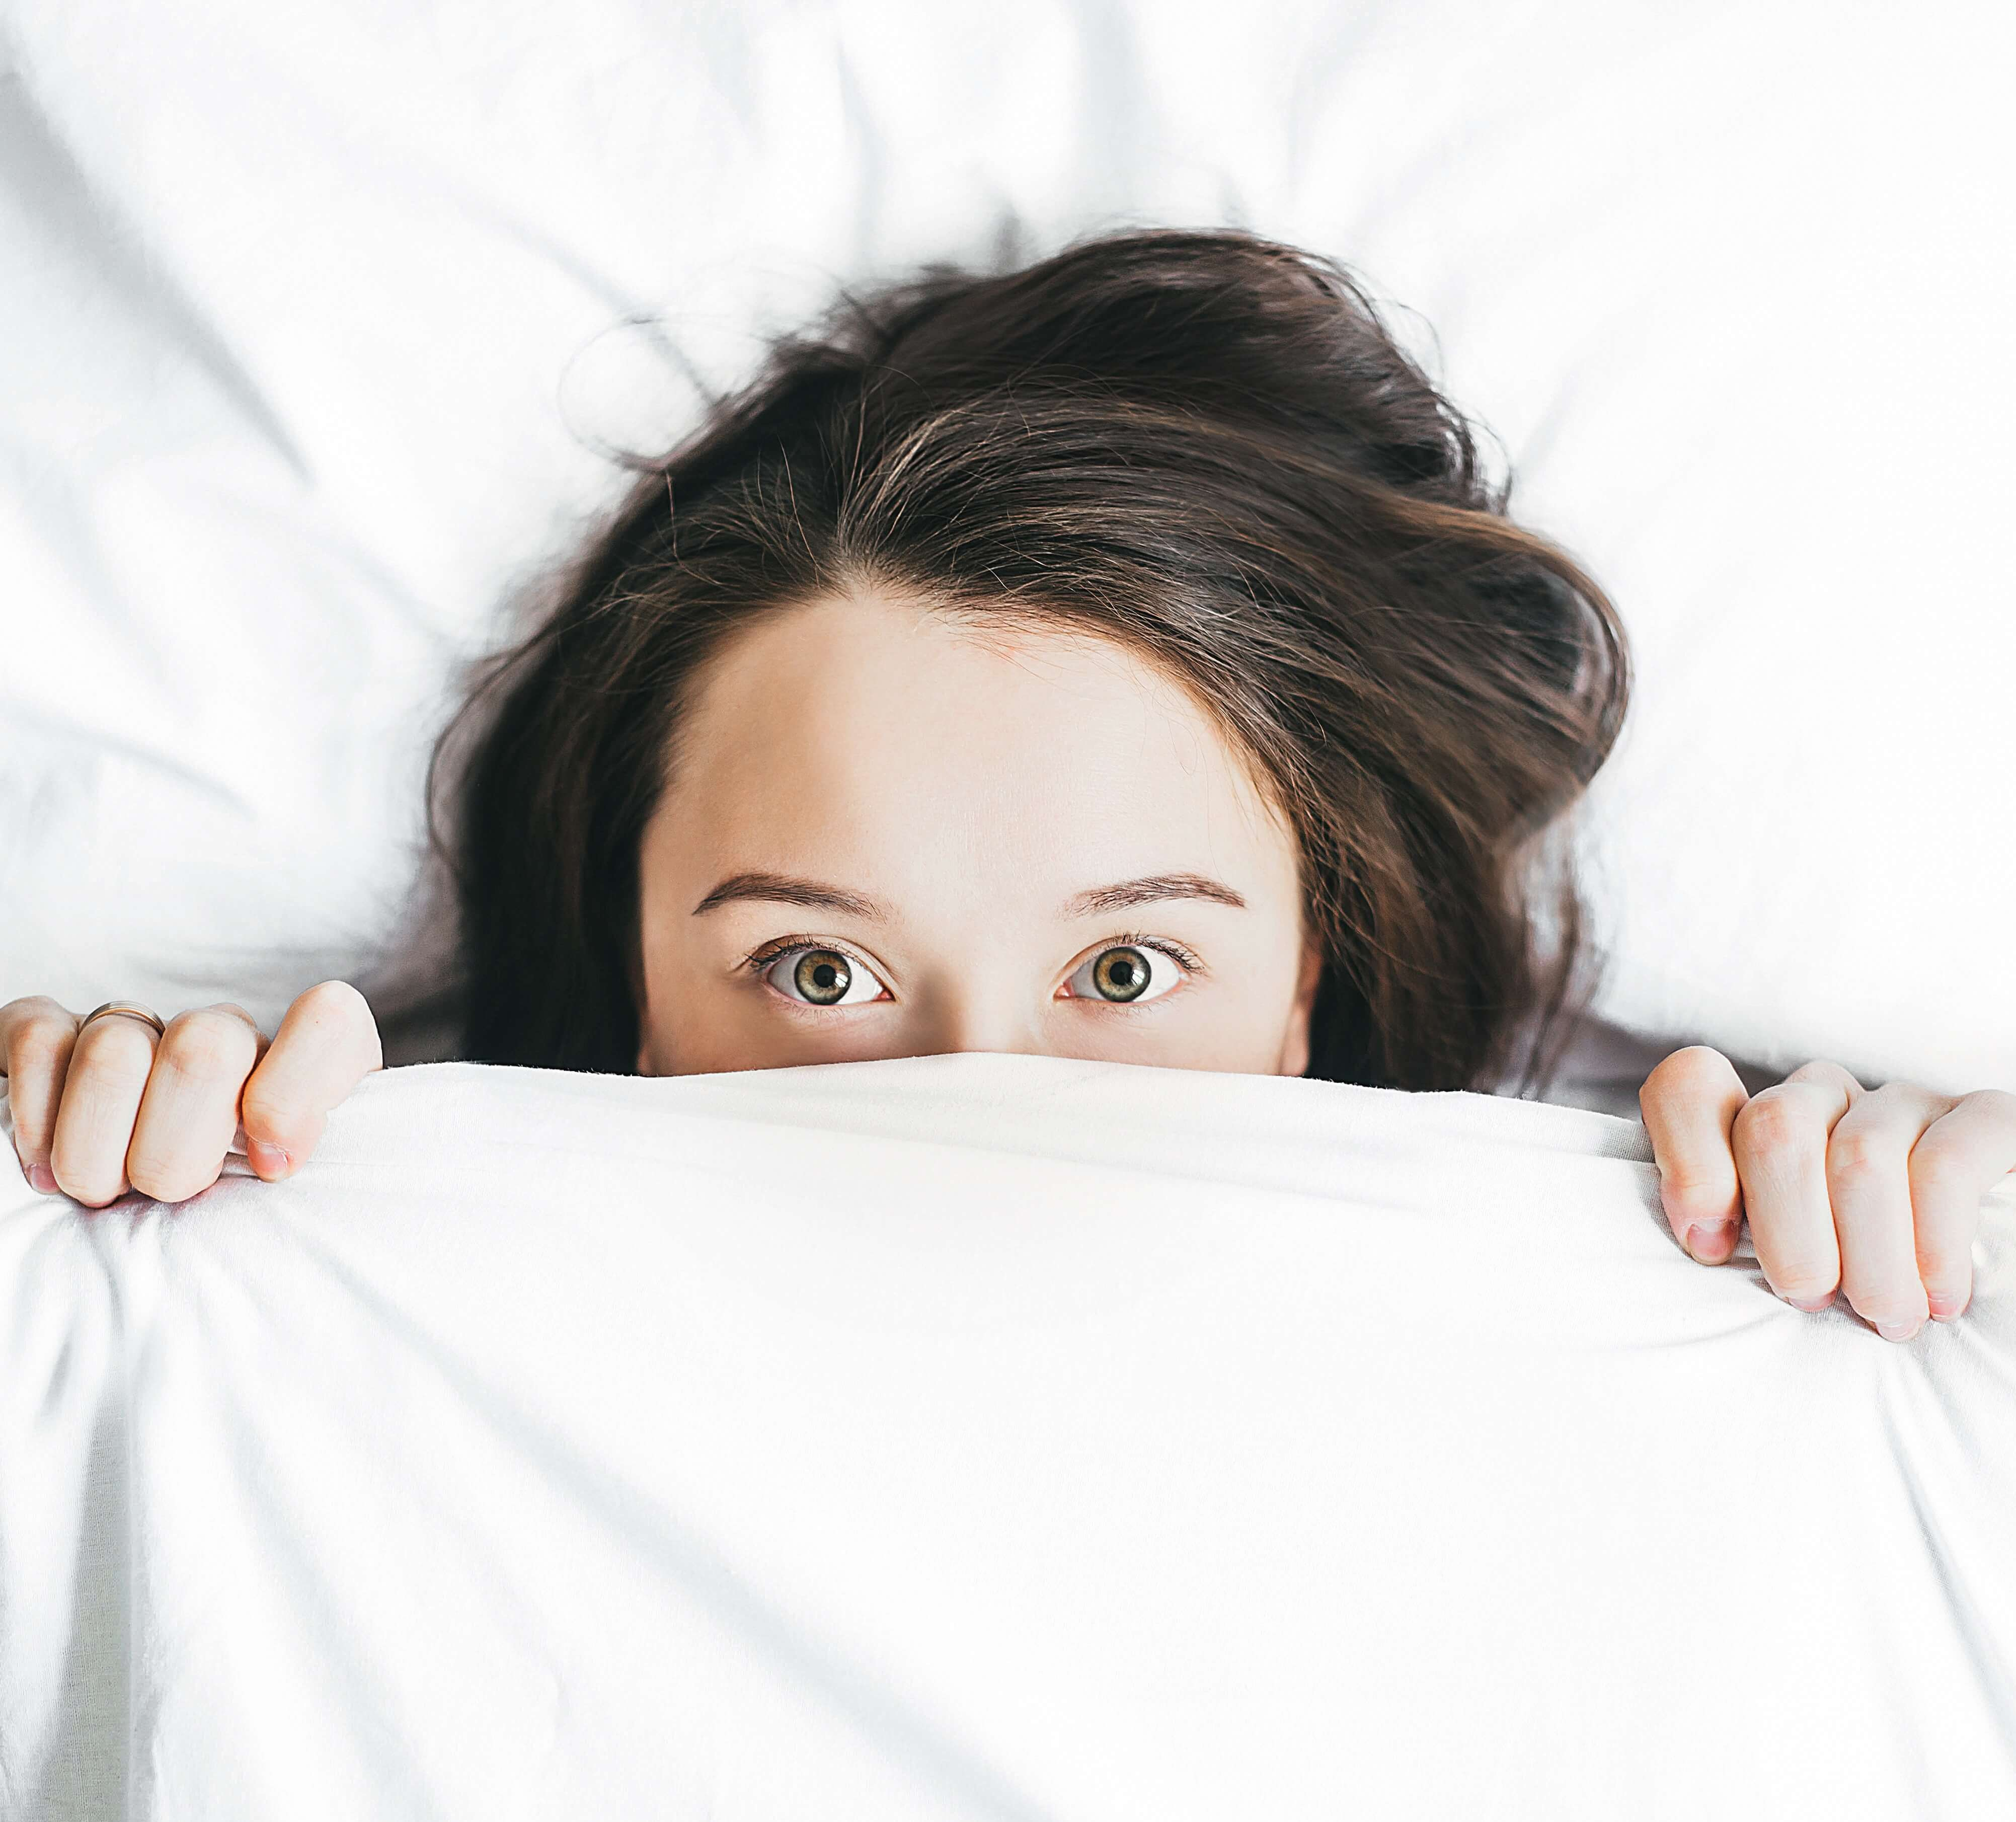 woman hiding under blanket valapariso